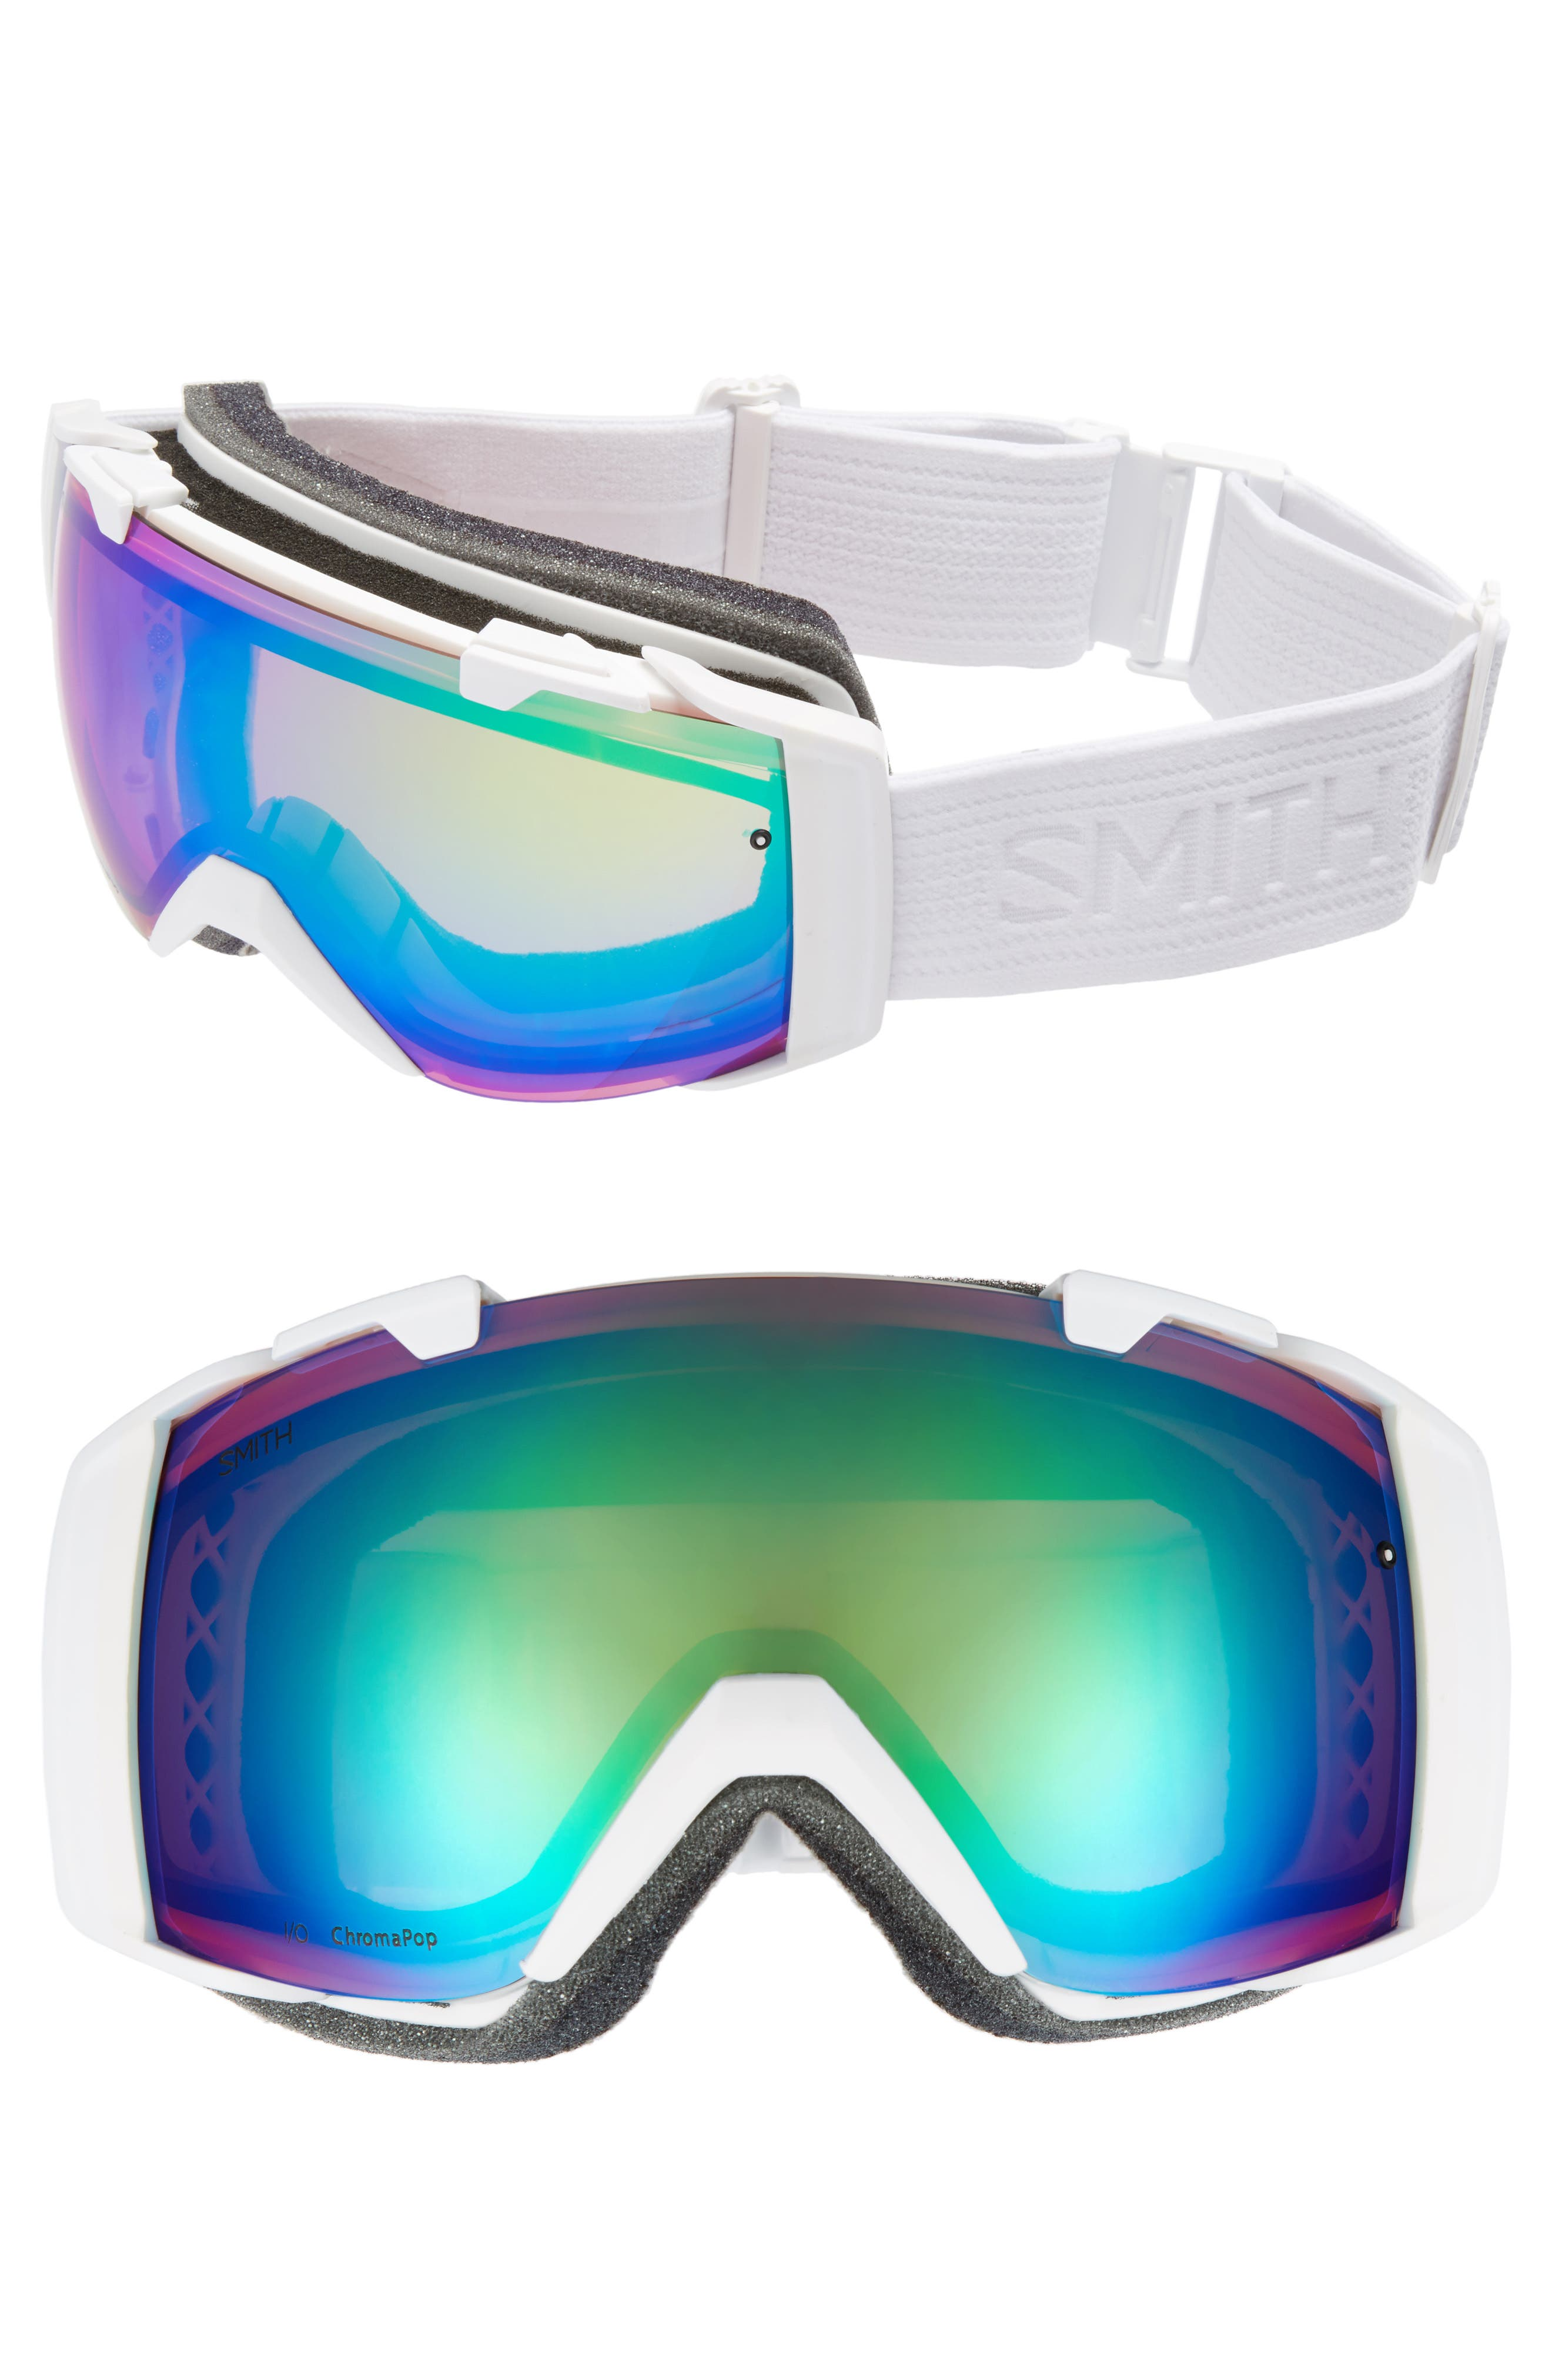 Alternate Image 1 Selected - Smith I/O 180mm Snow/Ski Goggles